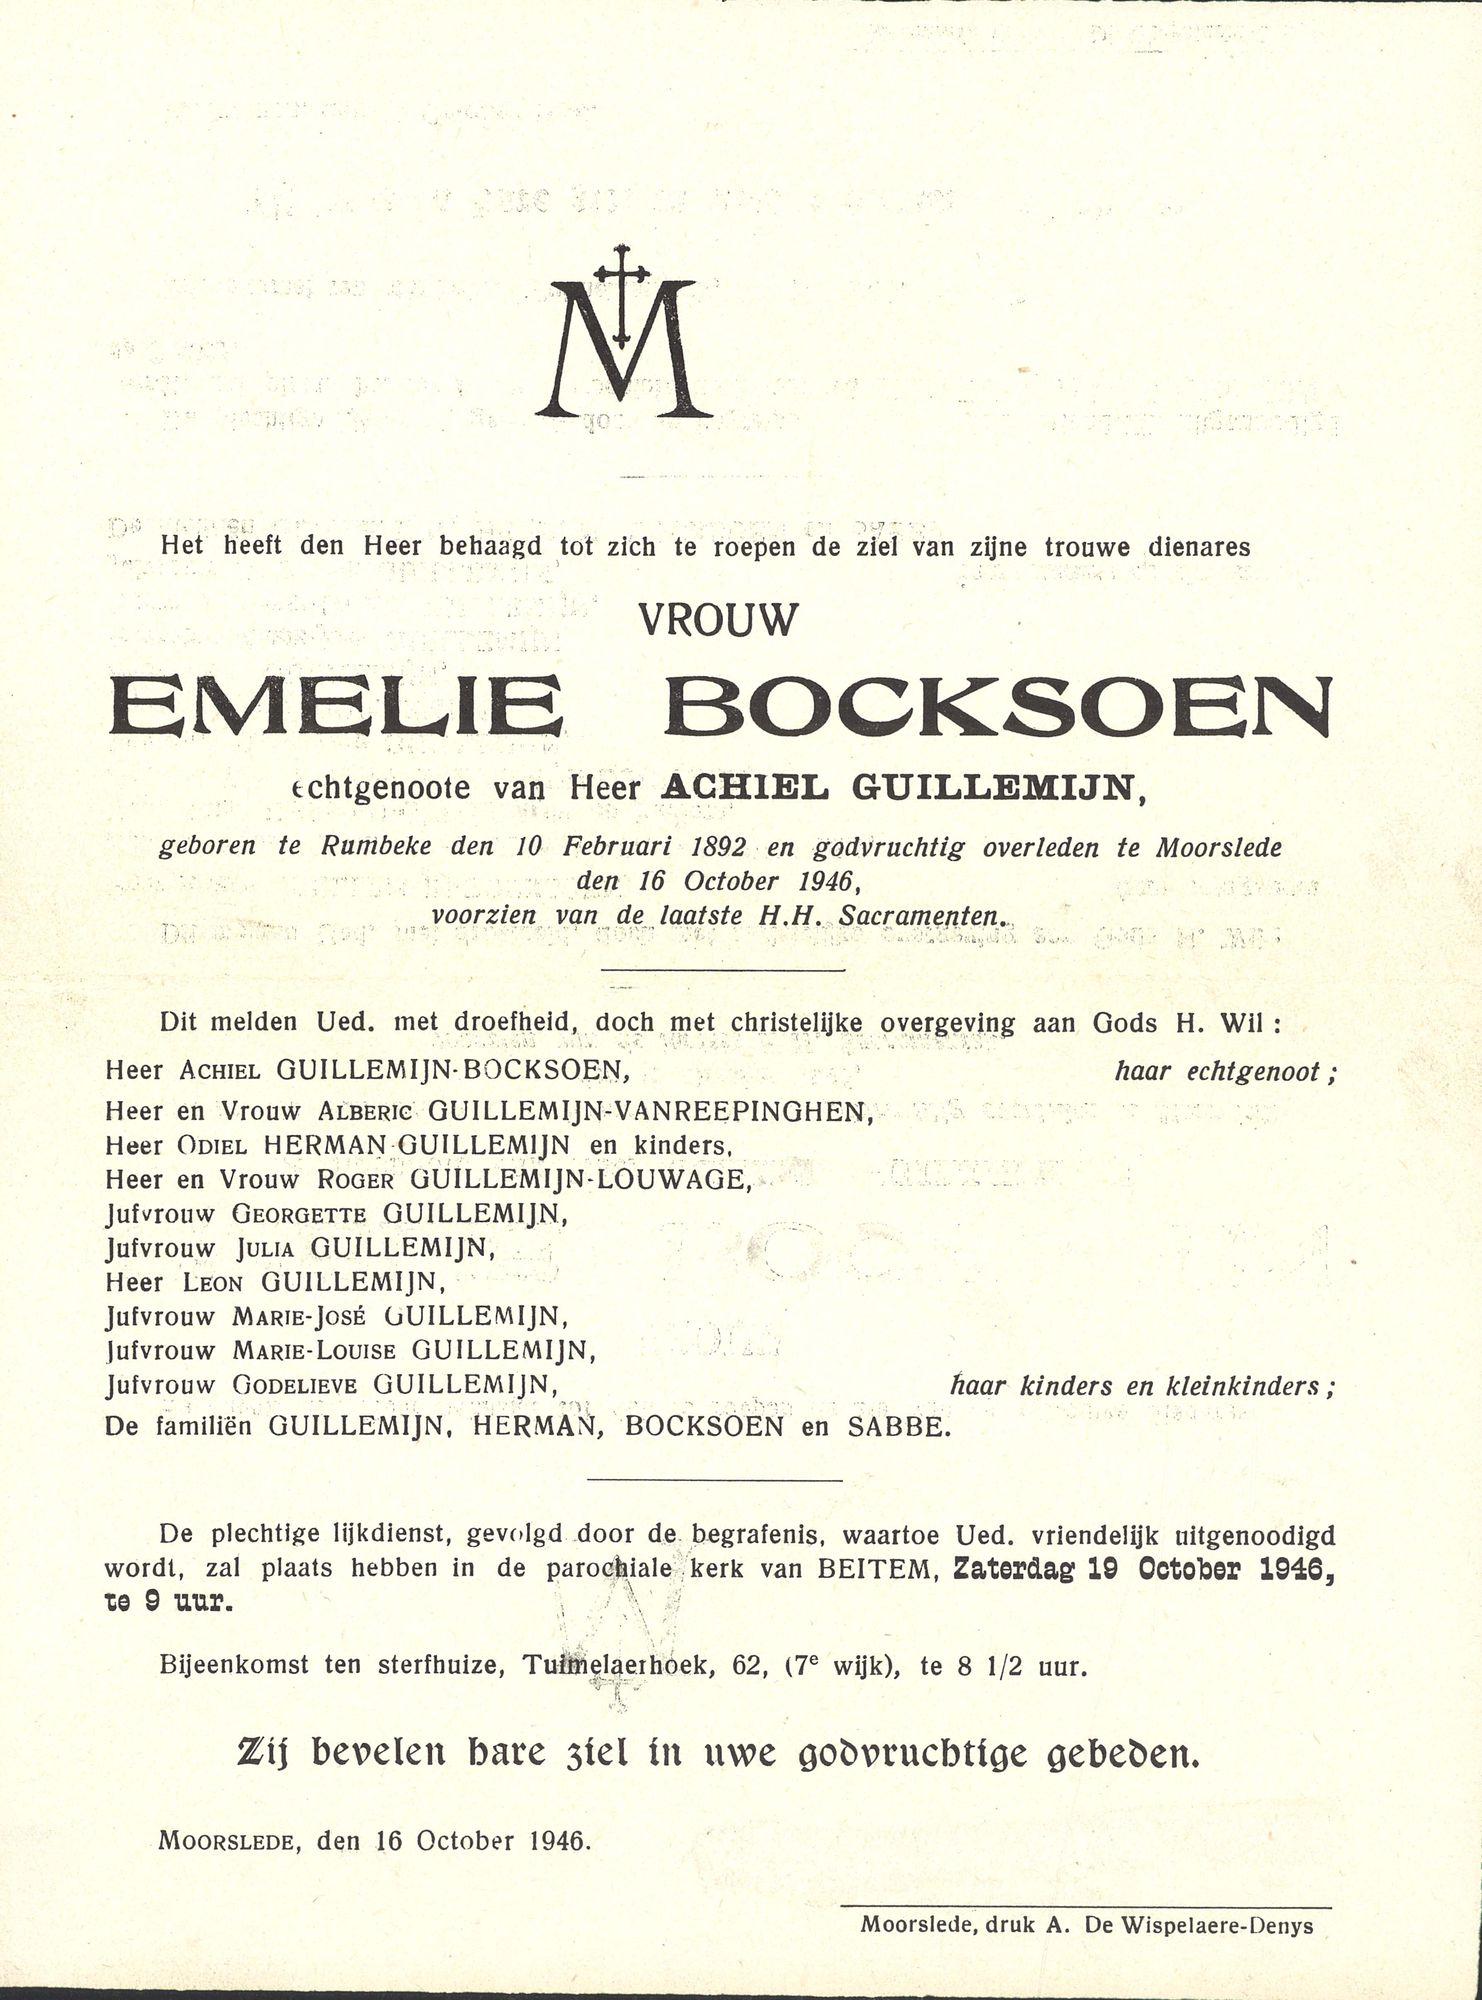 Emelie Bocksoen